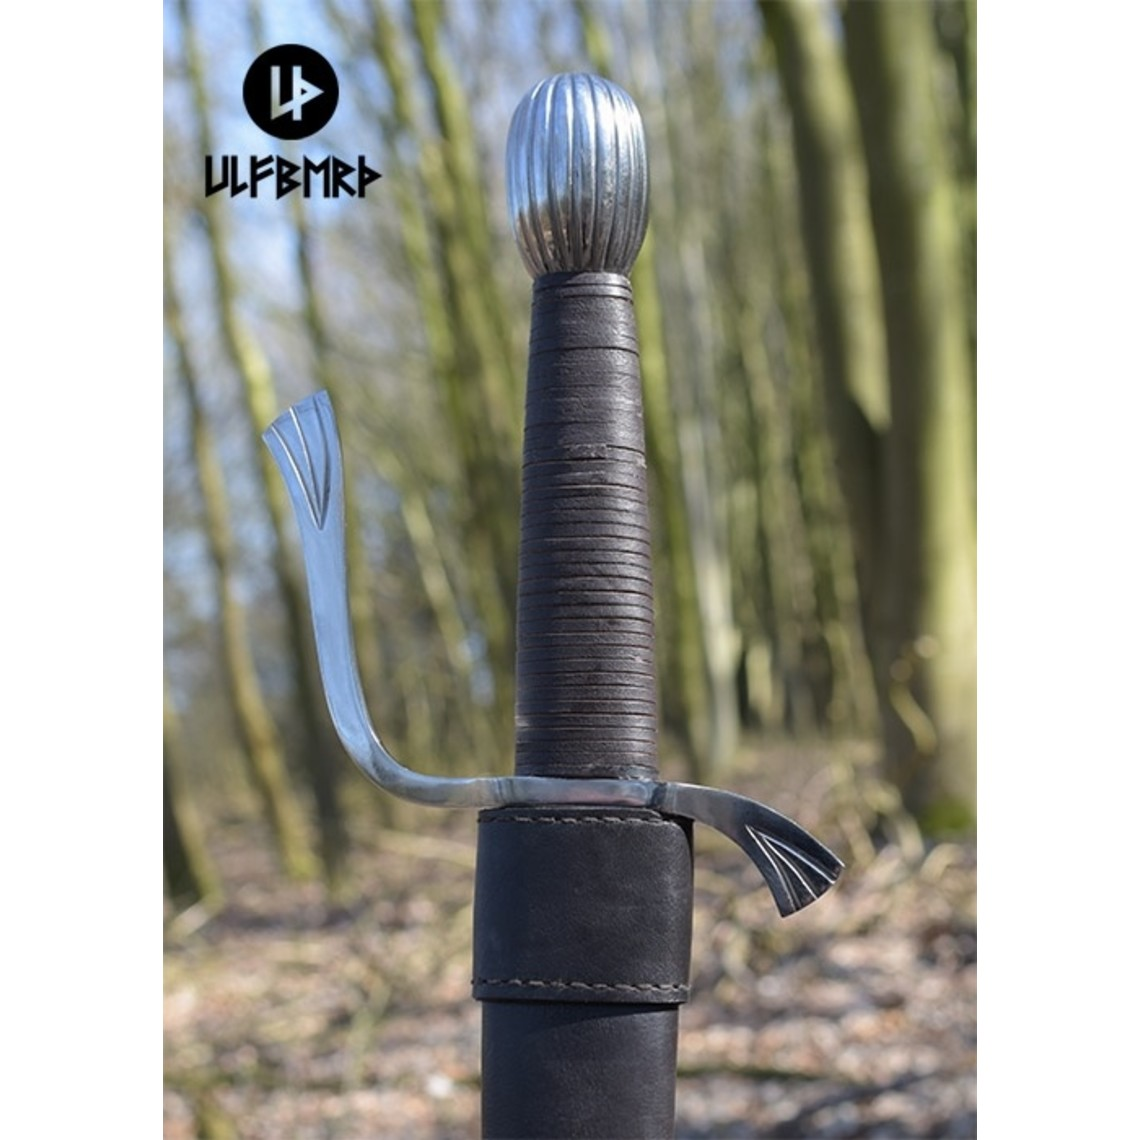 Ulfberth Middeleeuwse falchion, battle-ready